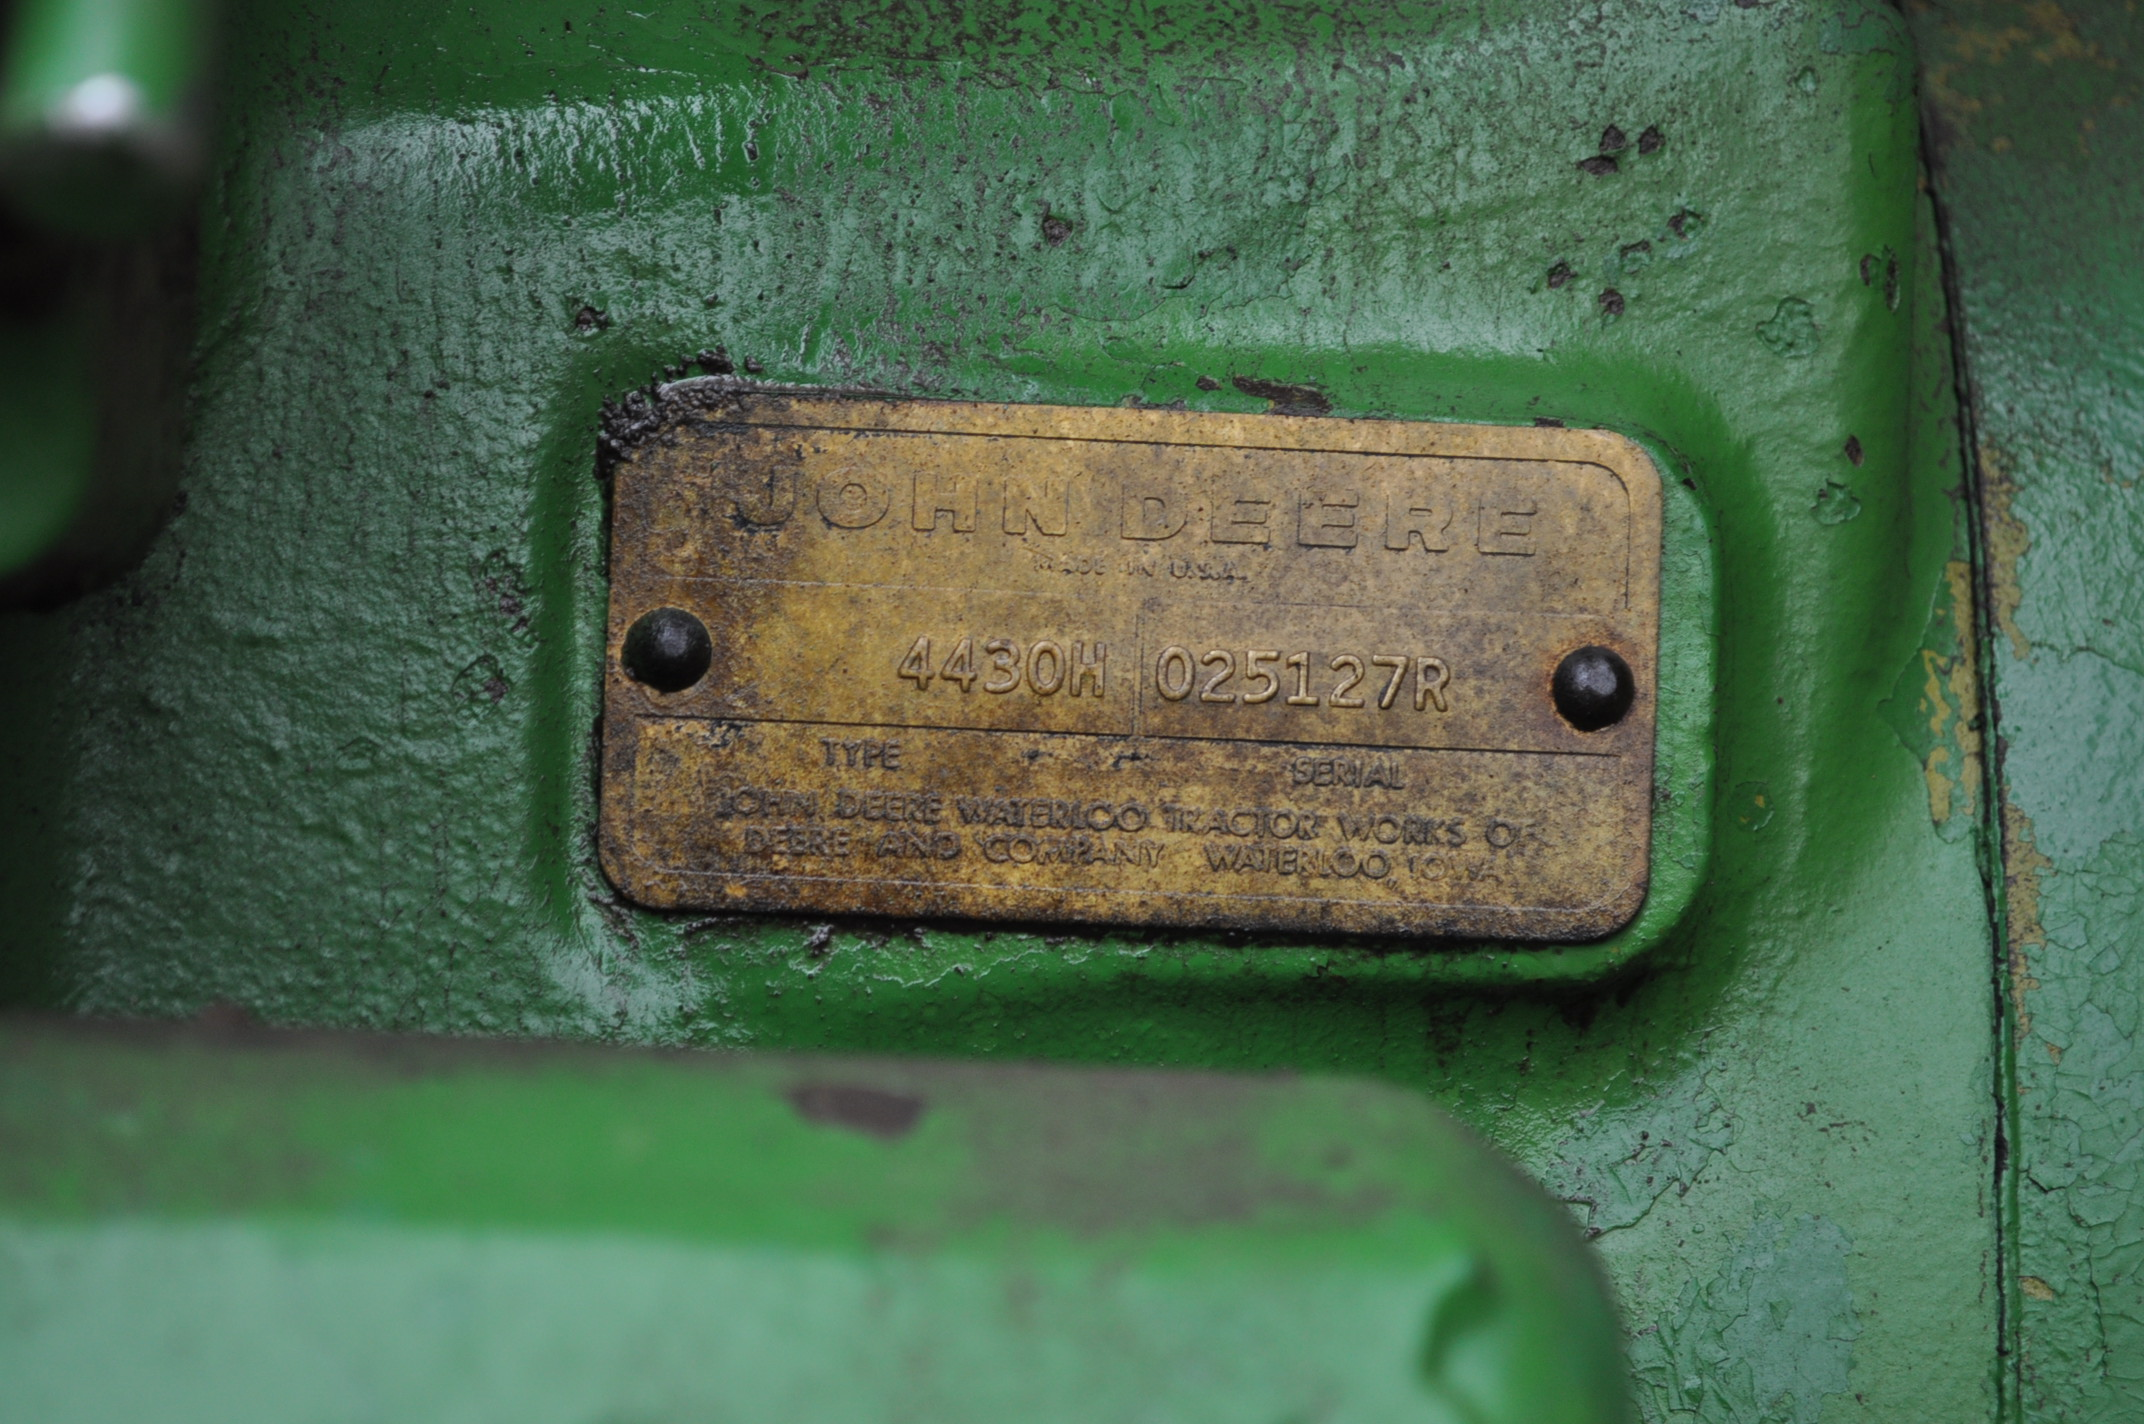 John Deere 4430 tractor, diesel, 18.4-34 hub duals, 10.00-16 front, CHA, Quad range, 2 hyd - Image 13 of 20